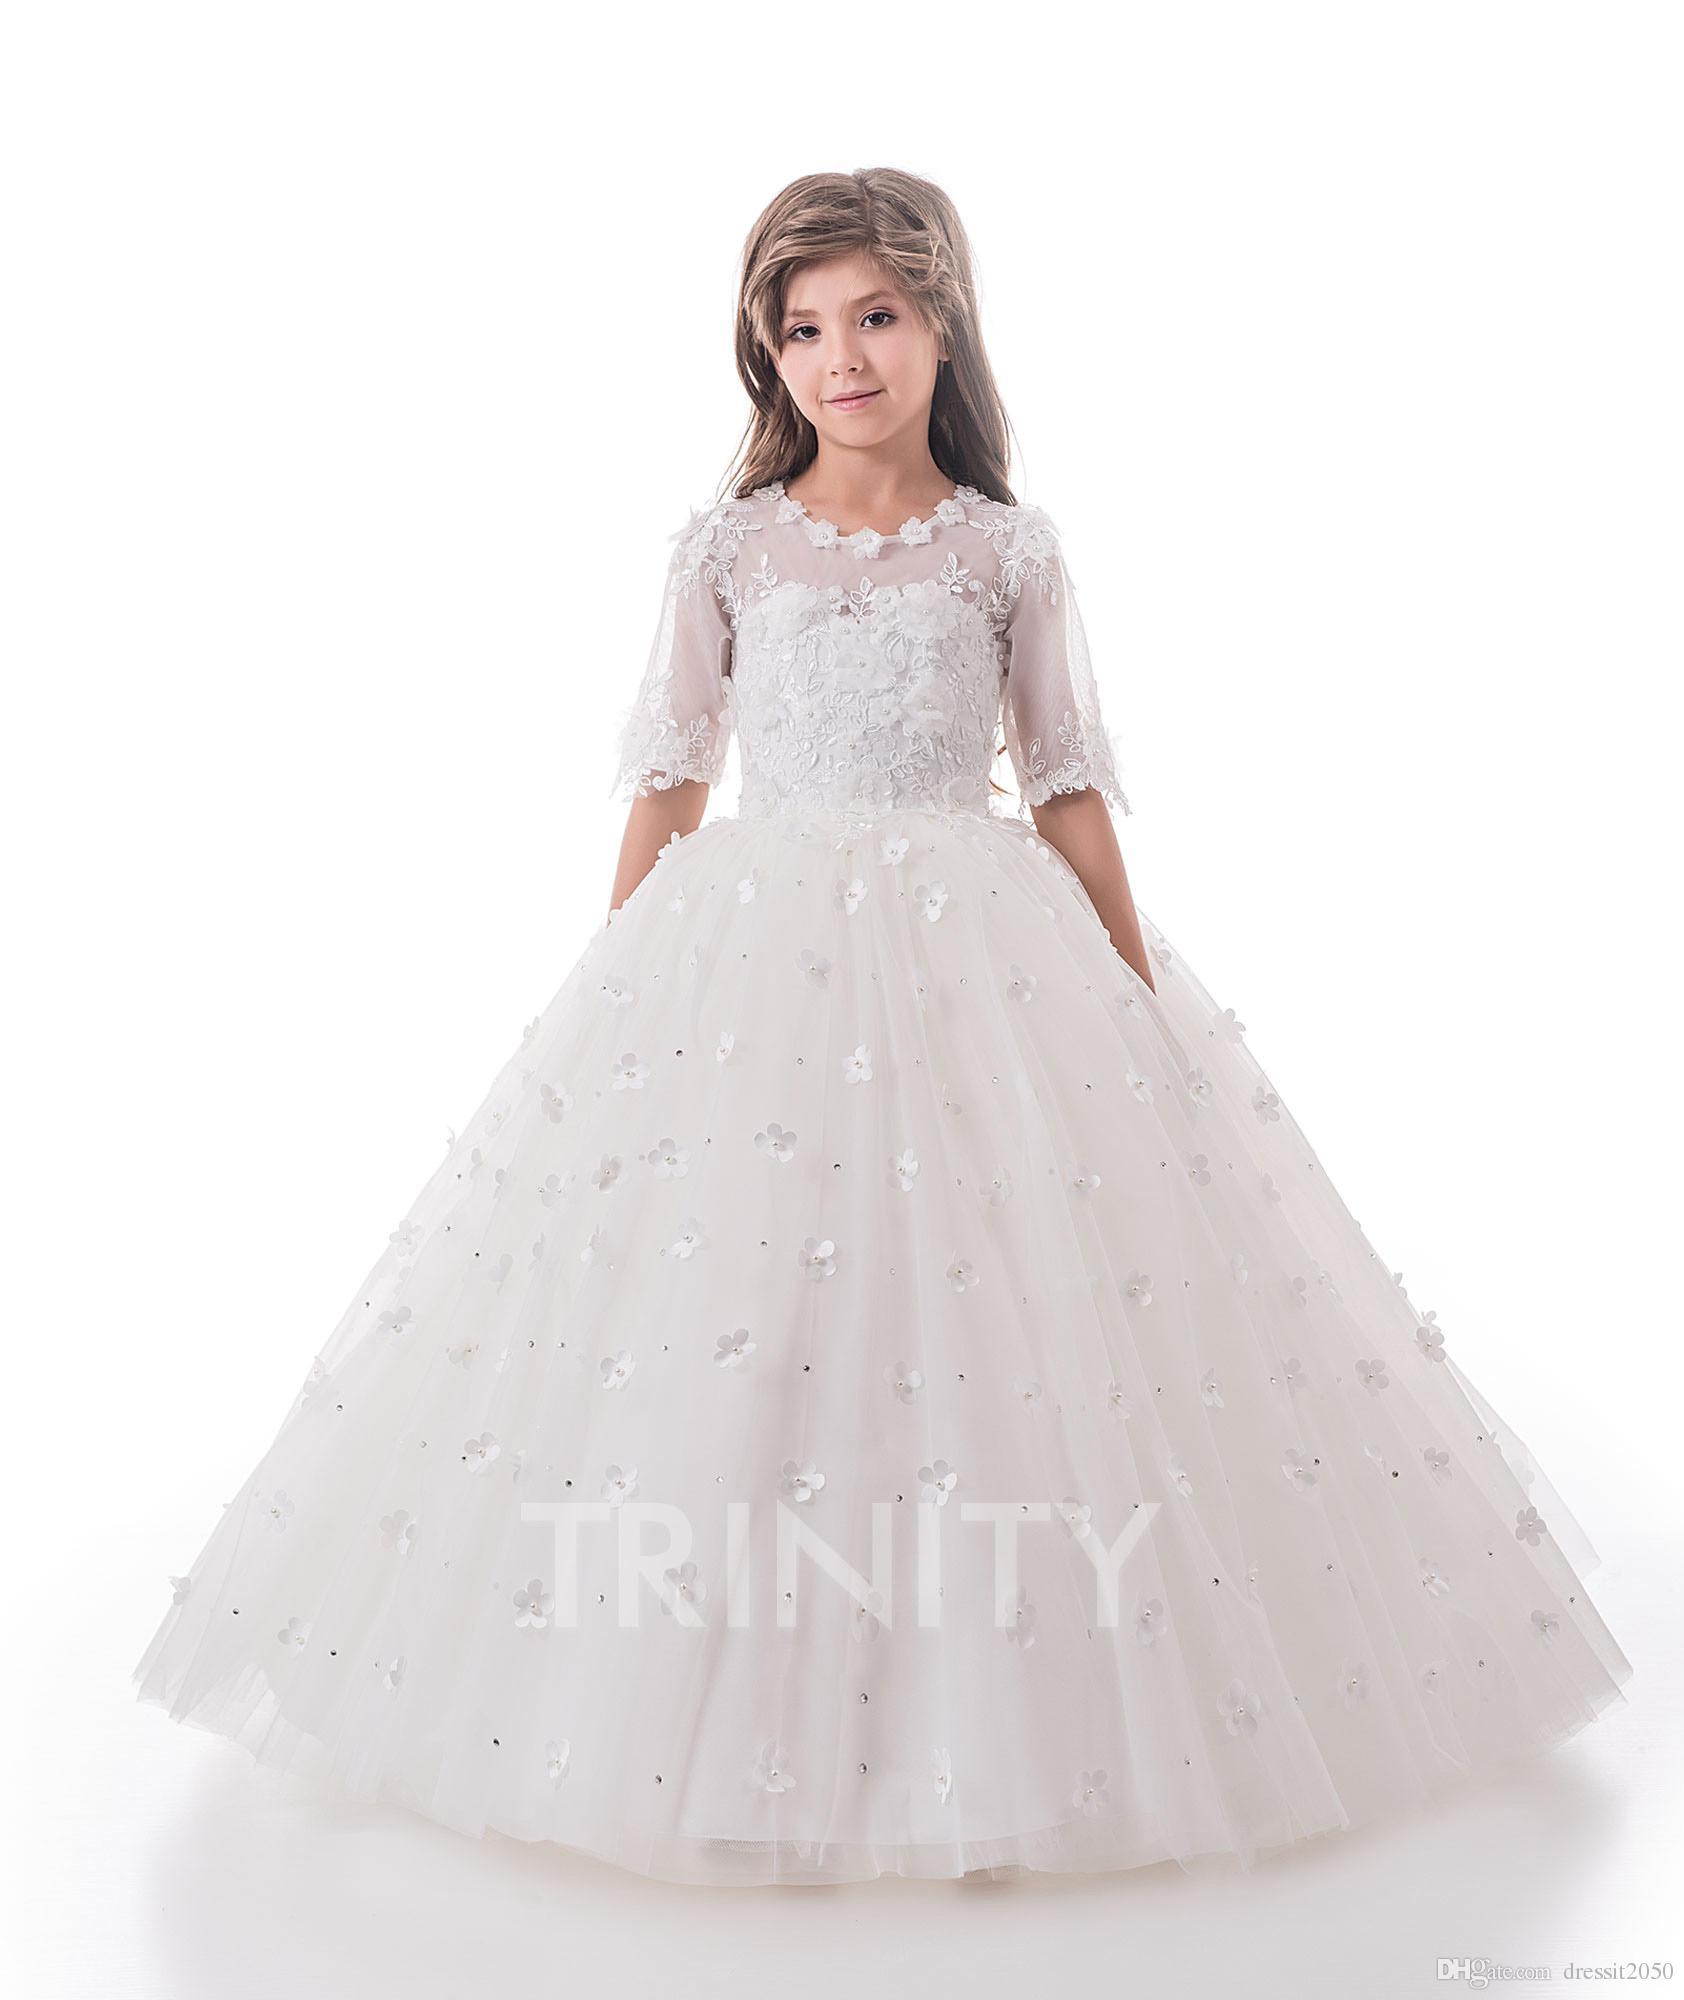 428b8a1cb Formal Dresses For Girls Size 14 | Saddha